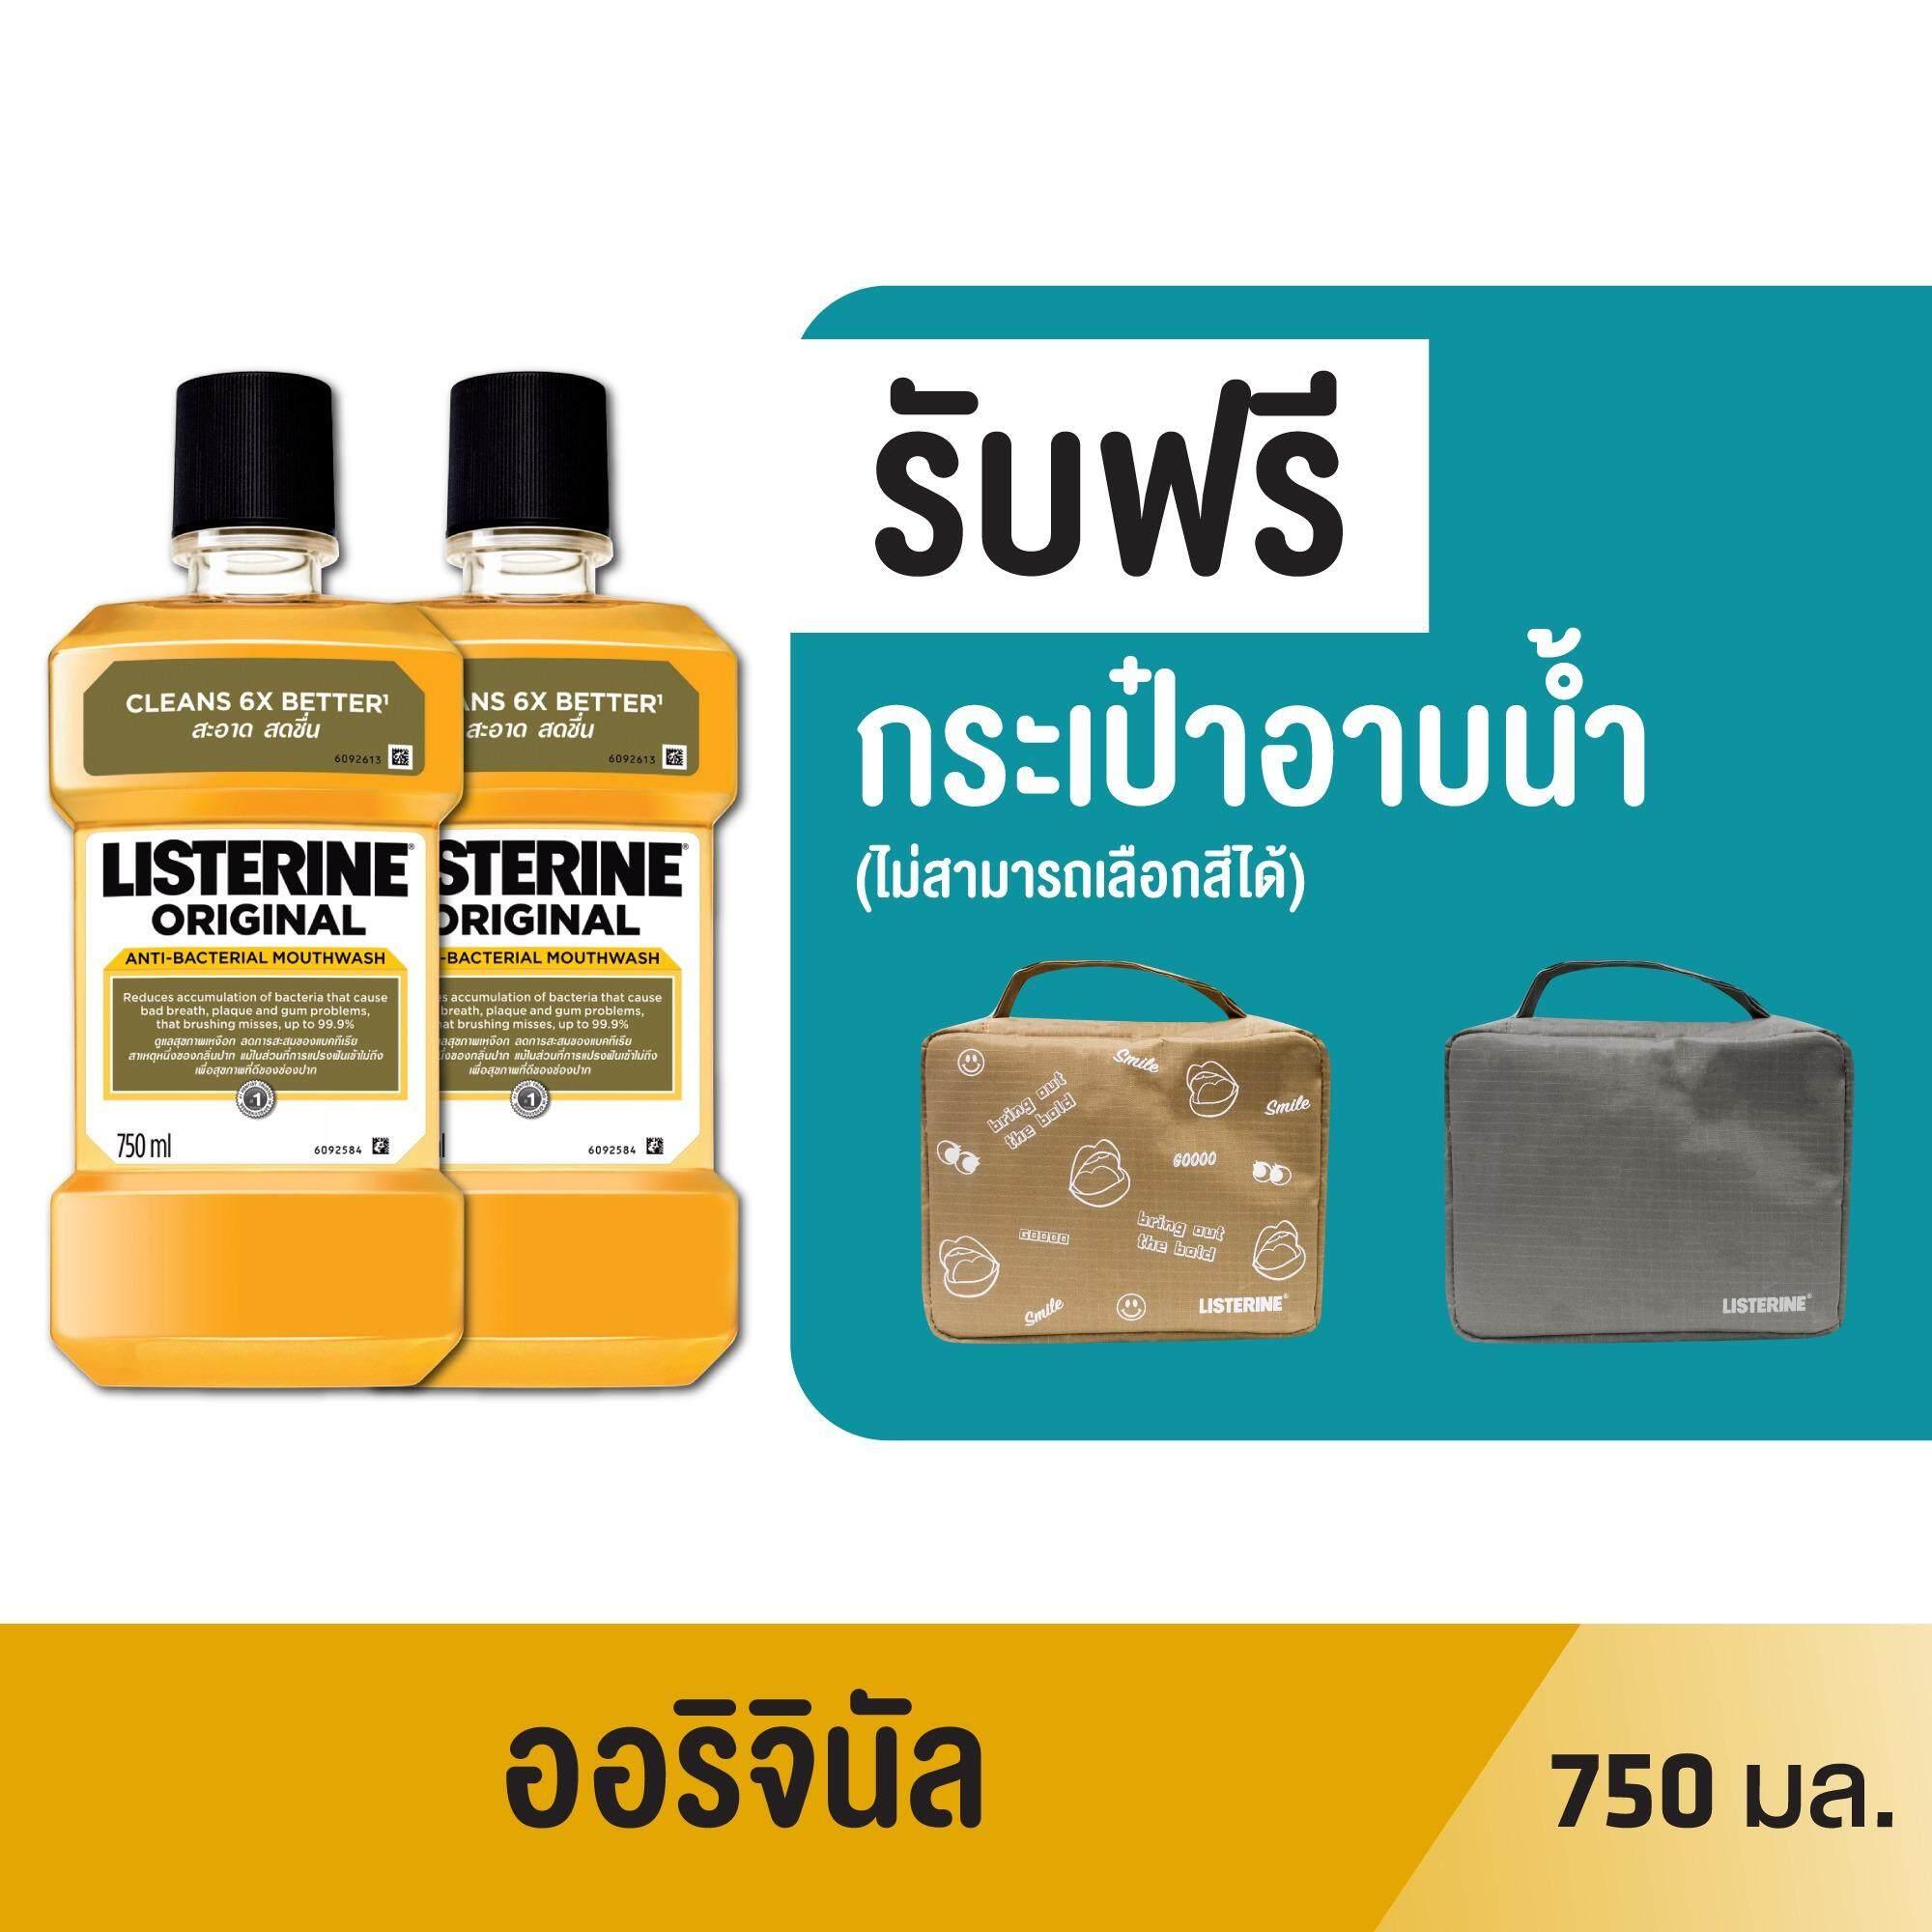 Listerine น้ำยาบ้วนปาก ลิสเตอรีน ออริจินัล 750 มล. x 2 (ฟรีกระเป๋า)